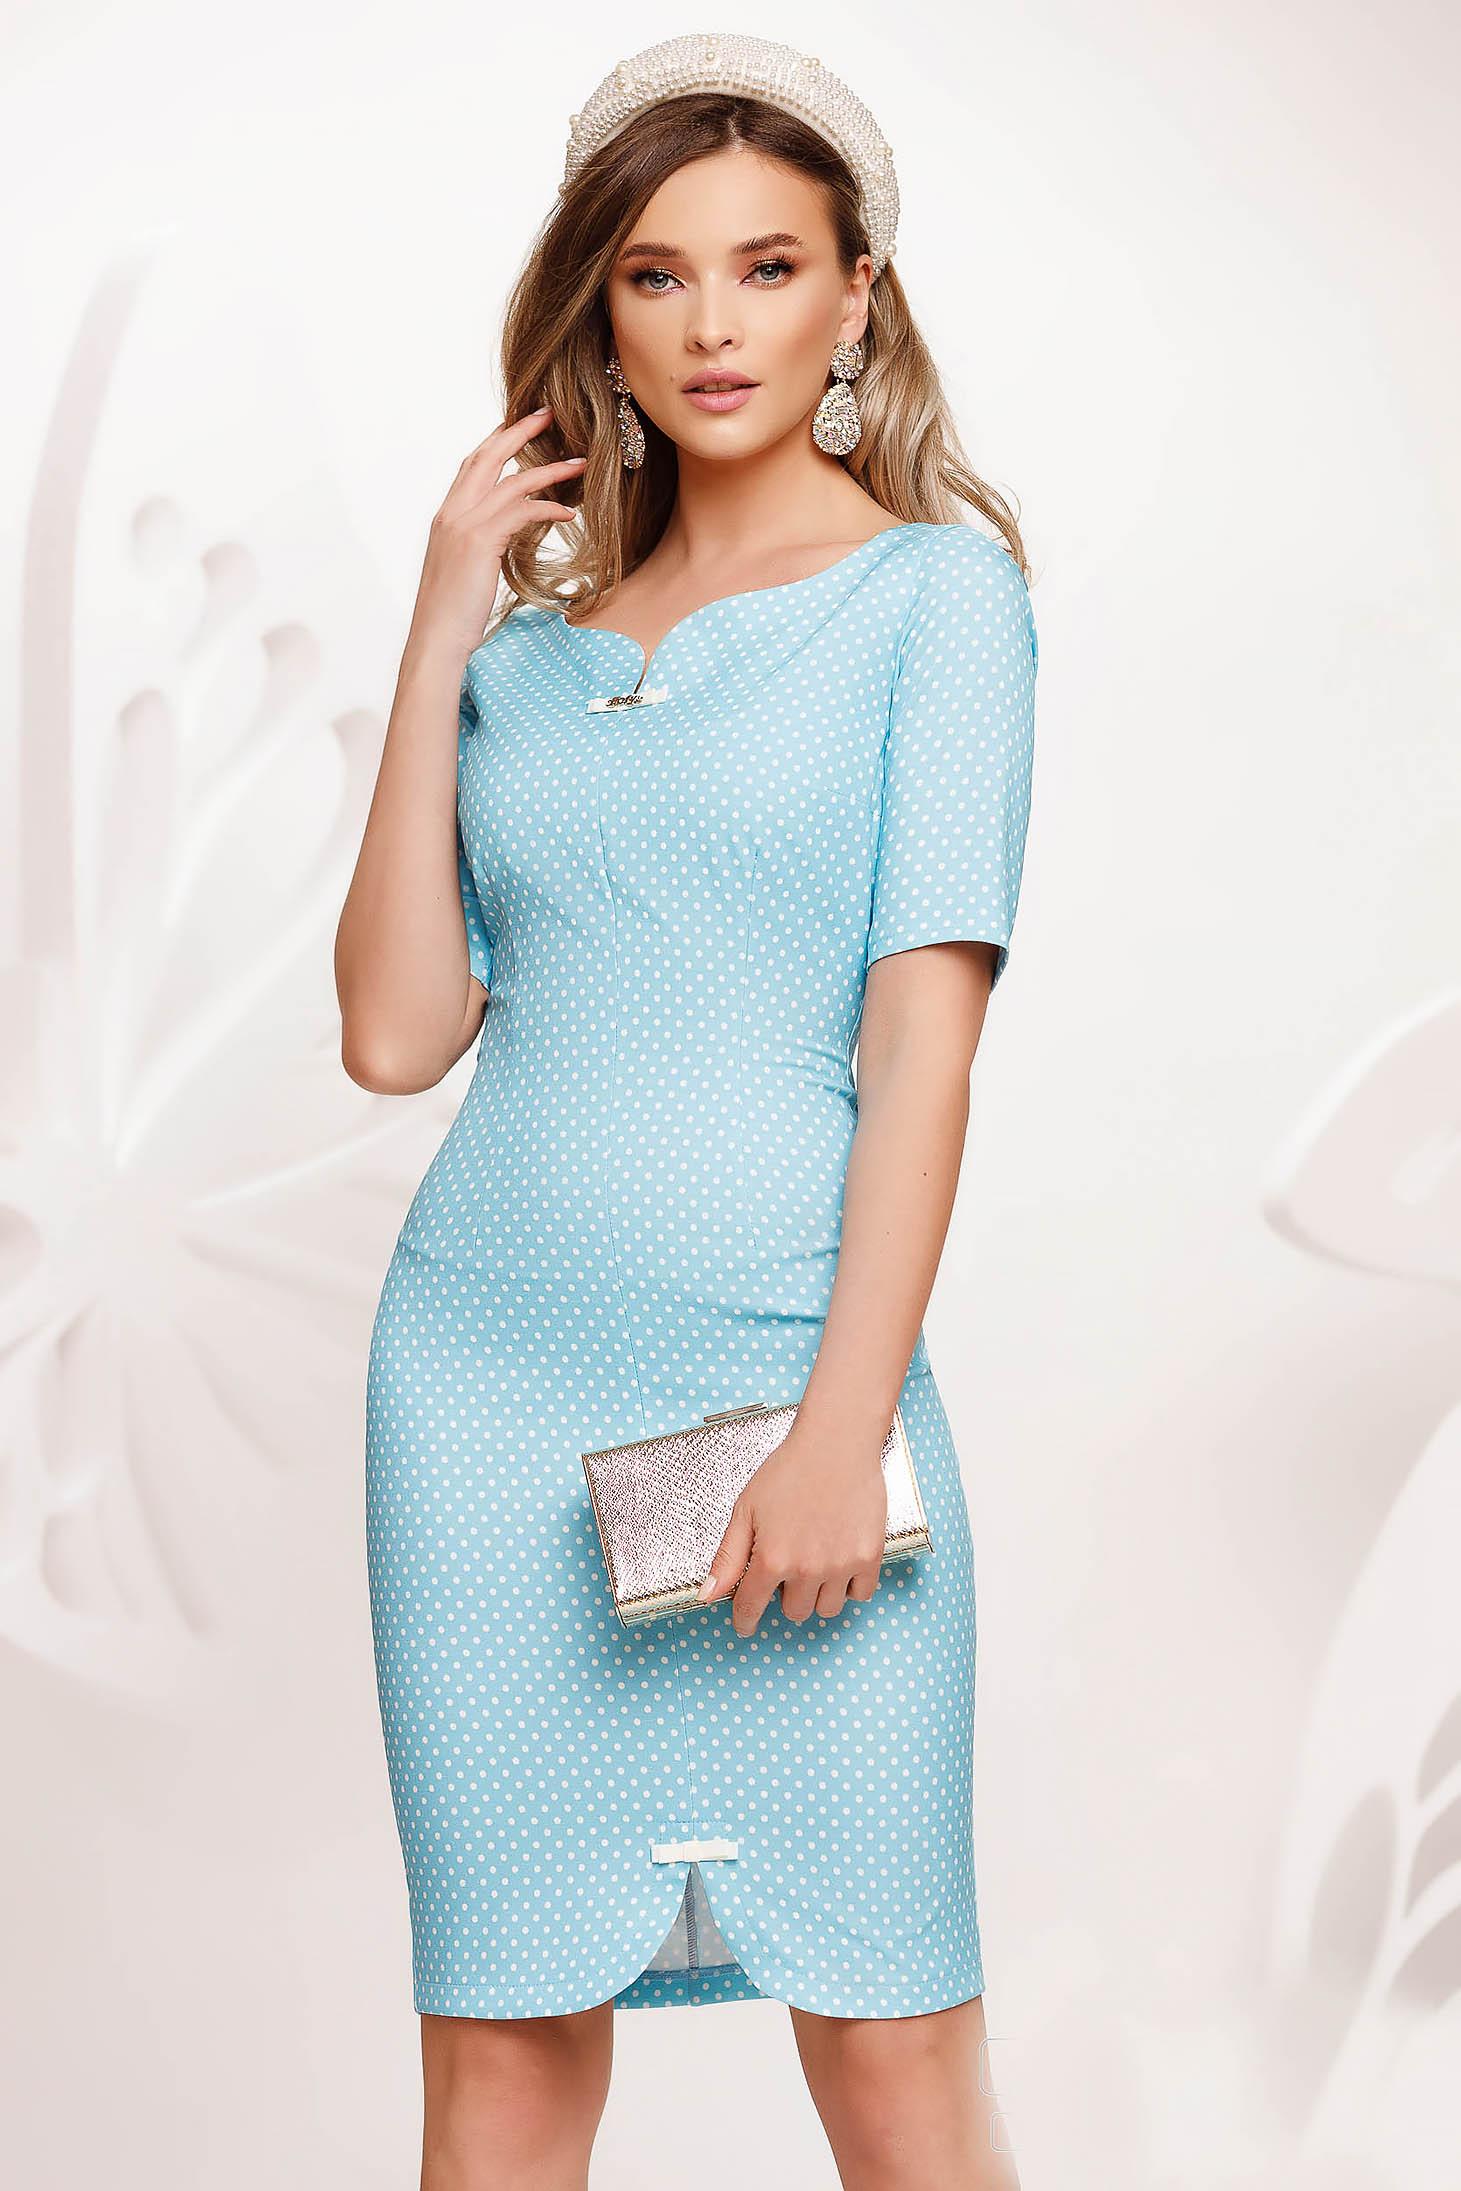 Lightblue dress short cut pencil slightly elastic fabric with bow accessories